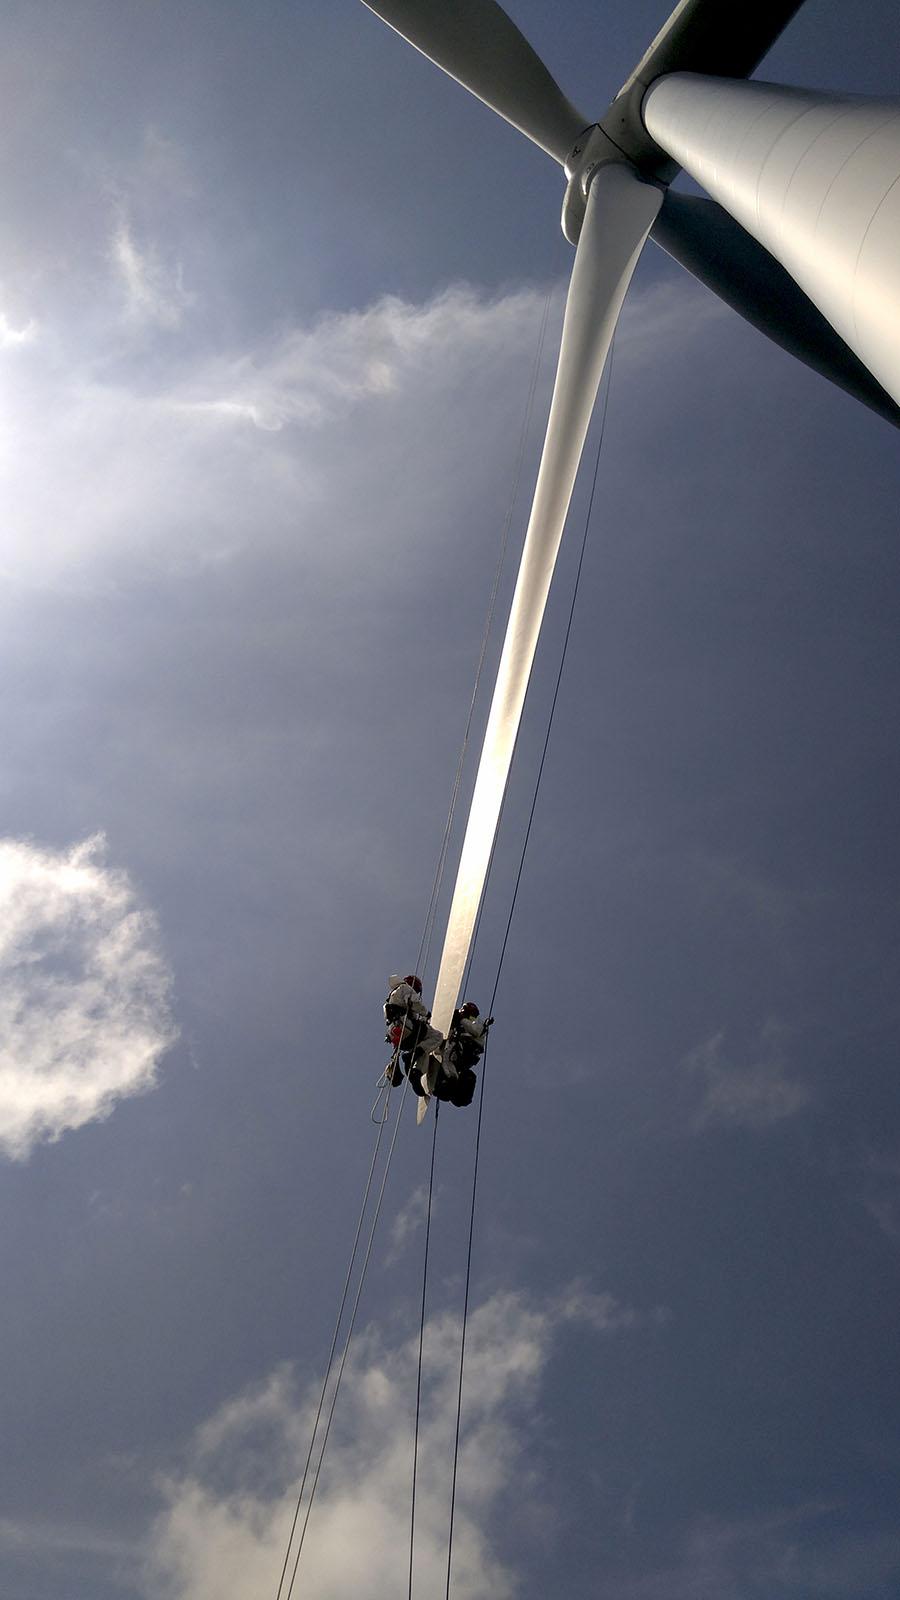 Blade repair, rope access, aerogeneradores